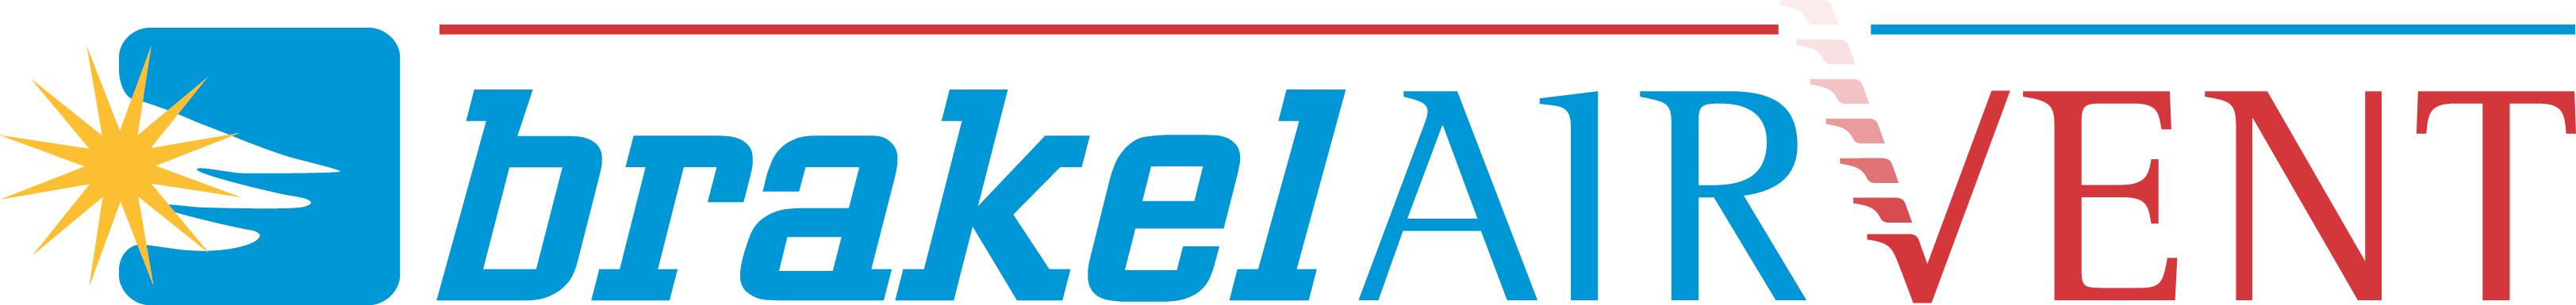 brakel-airvent-logo